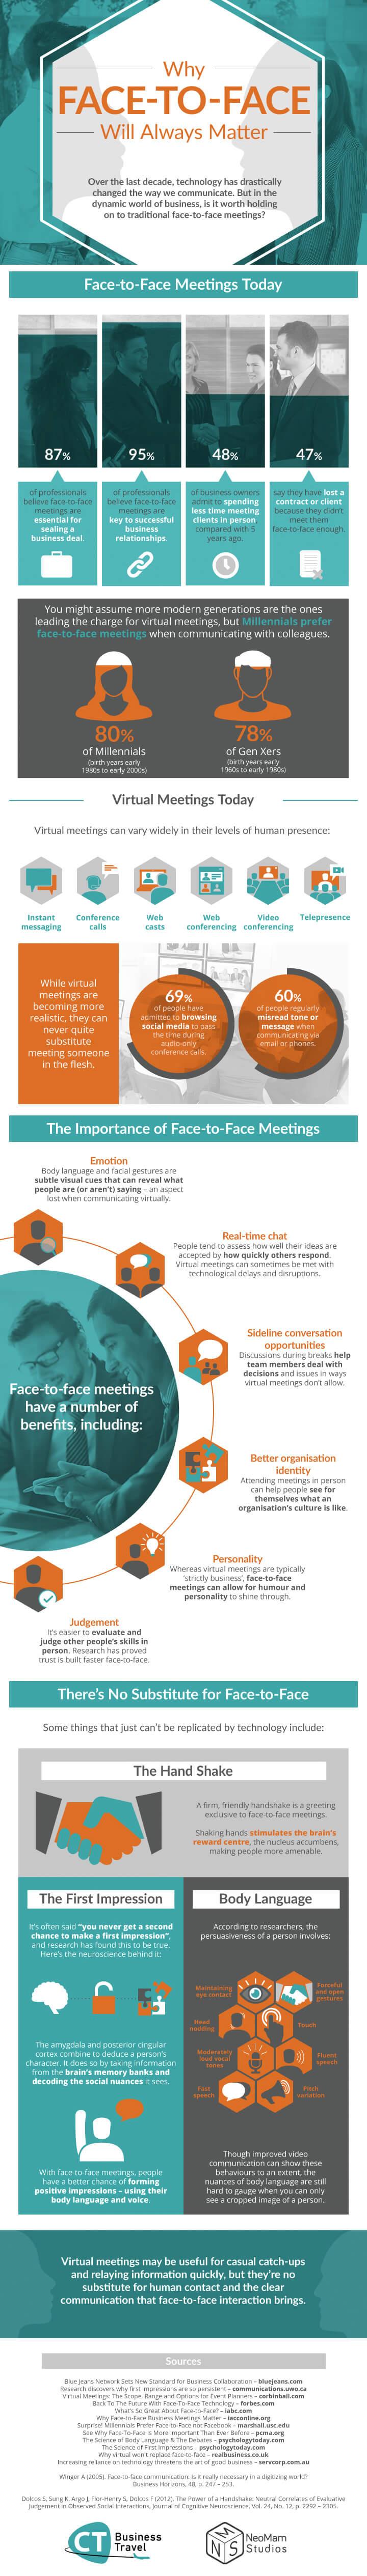 face-face-communication-wont-work